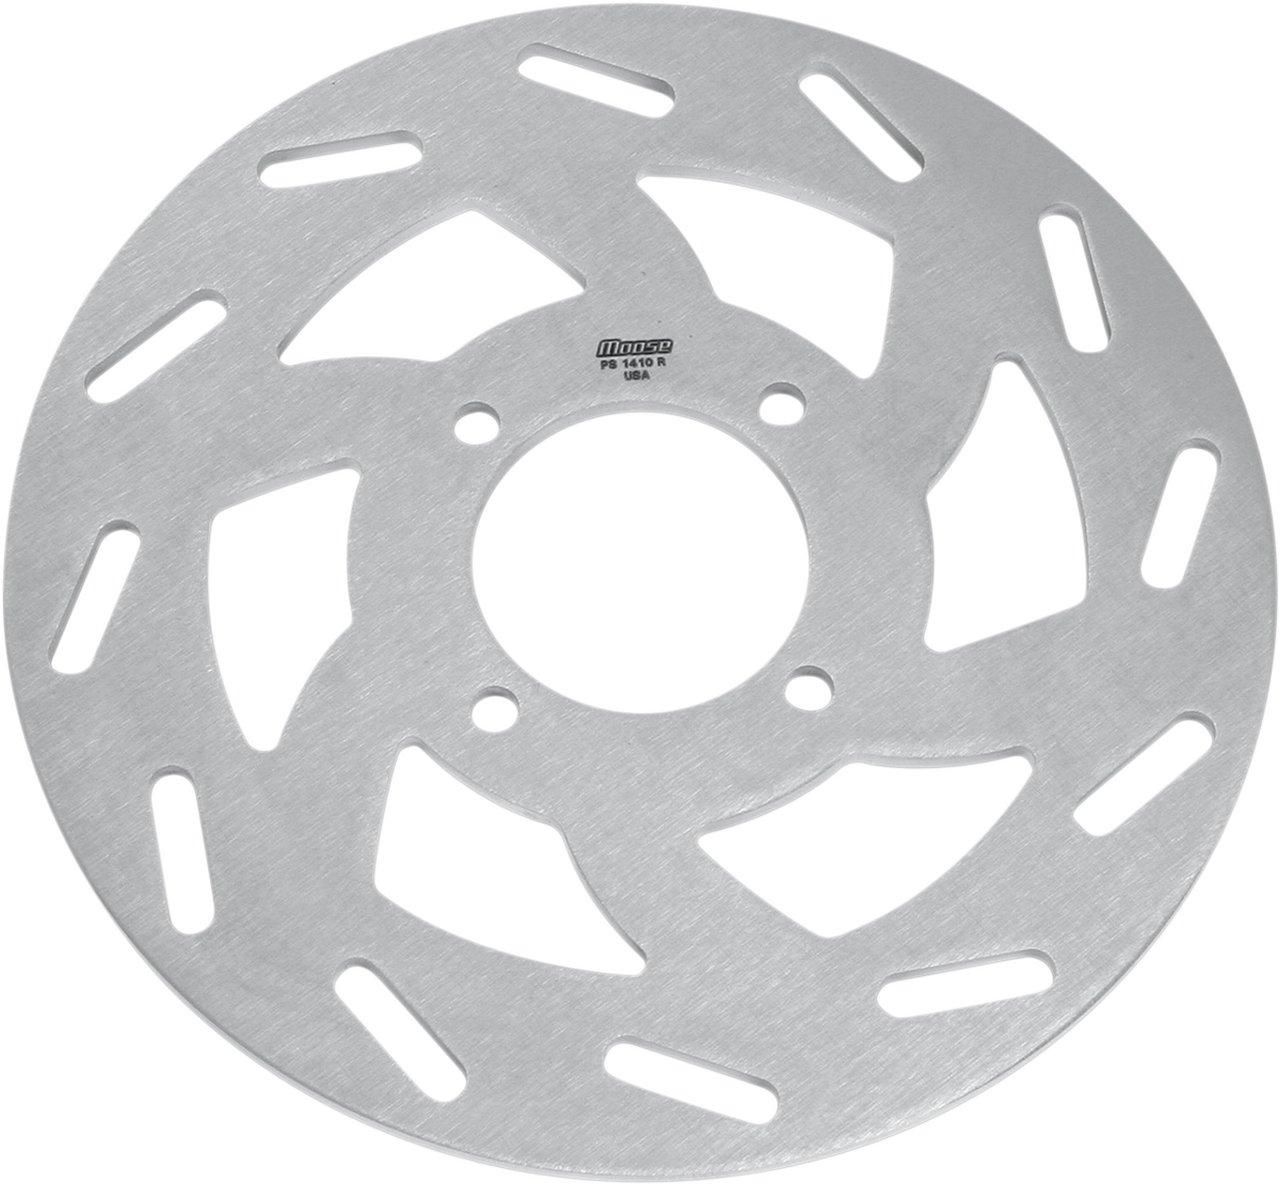 【MOOSE RACING】維修用煞車碟盤 [M061-1410] - 「Webike-摩托百貨」